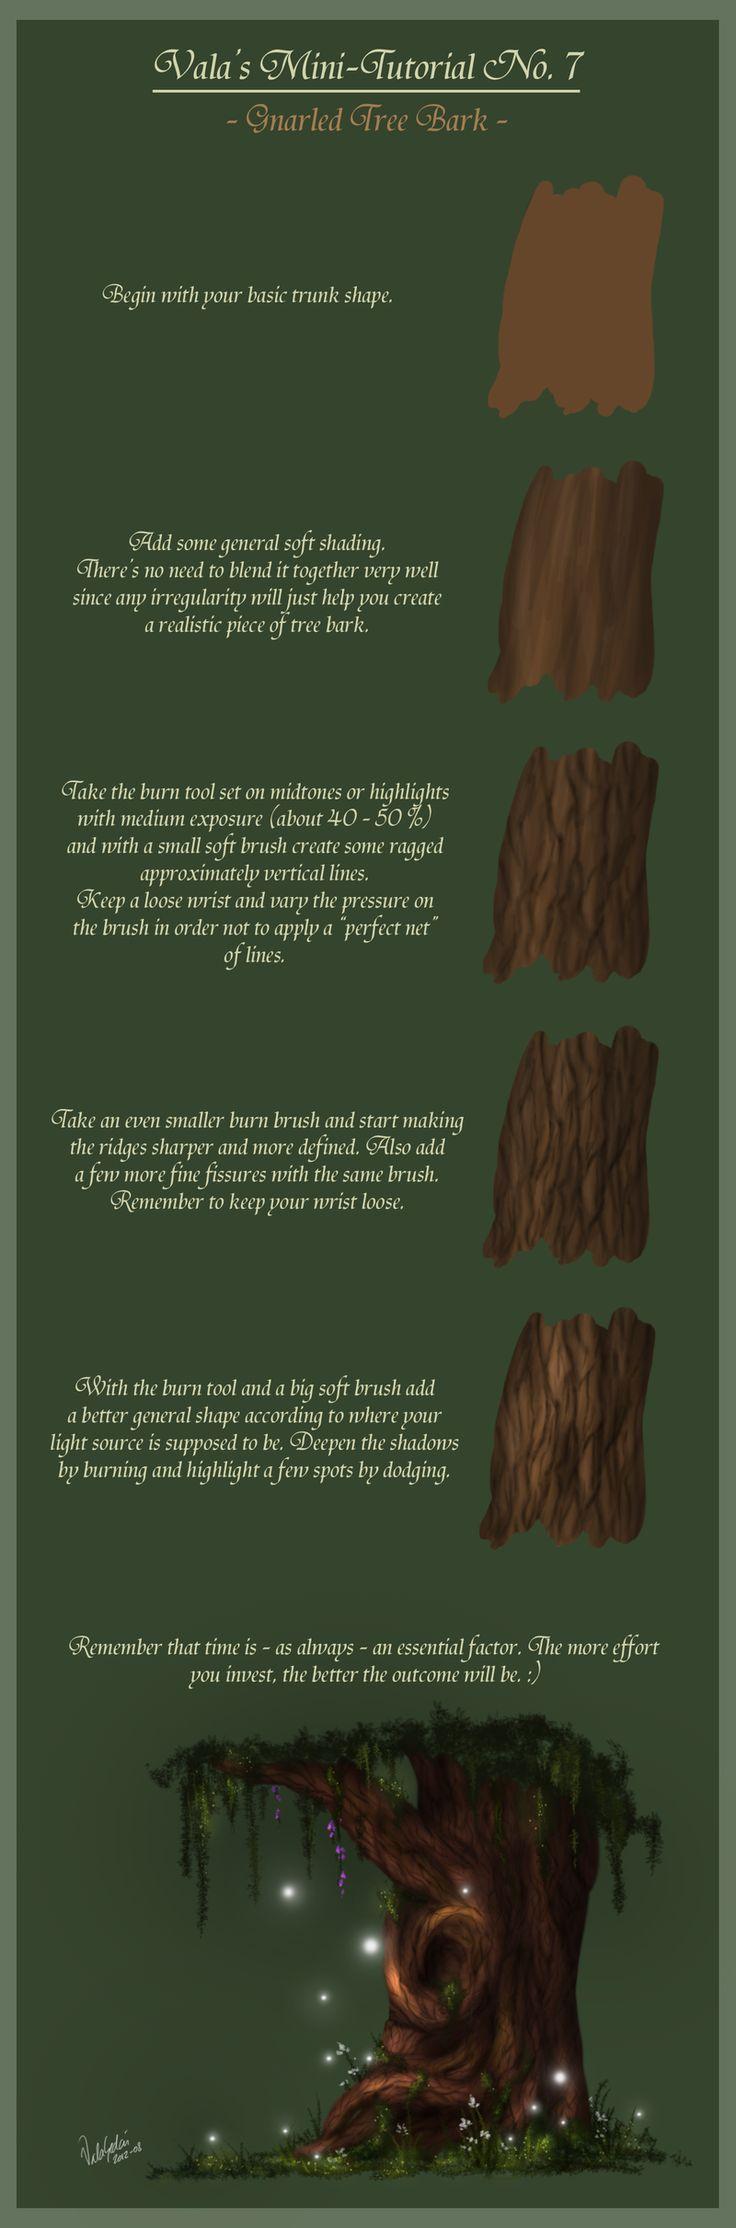 Mini-Tutorial No.7 - Gnarled Tree Bark - by ValaSedai on deviantART